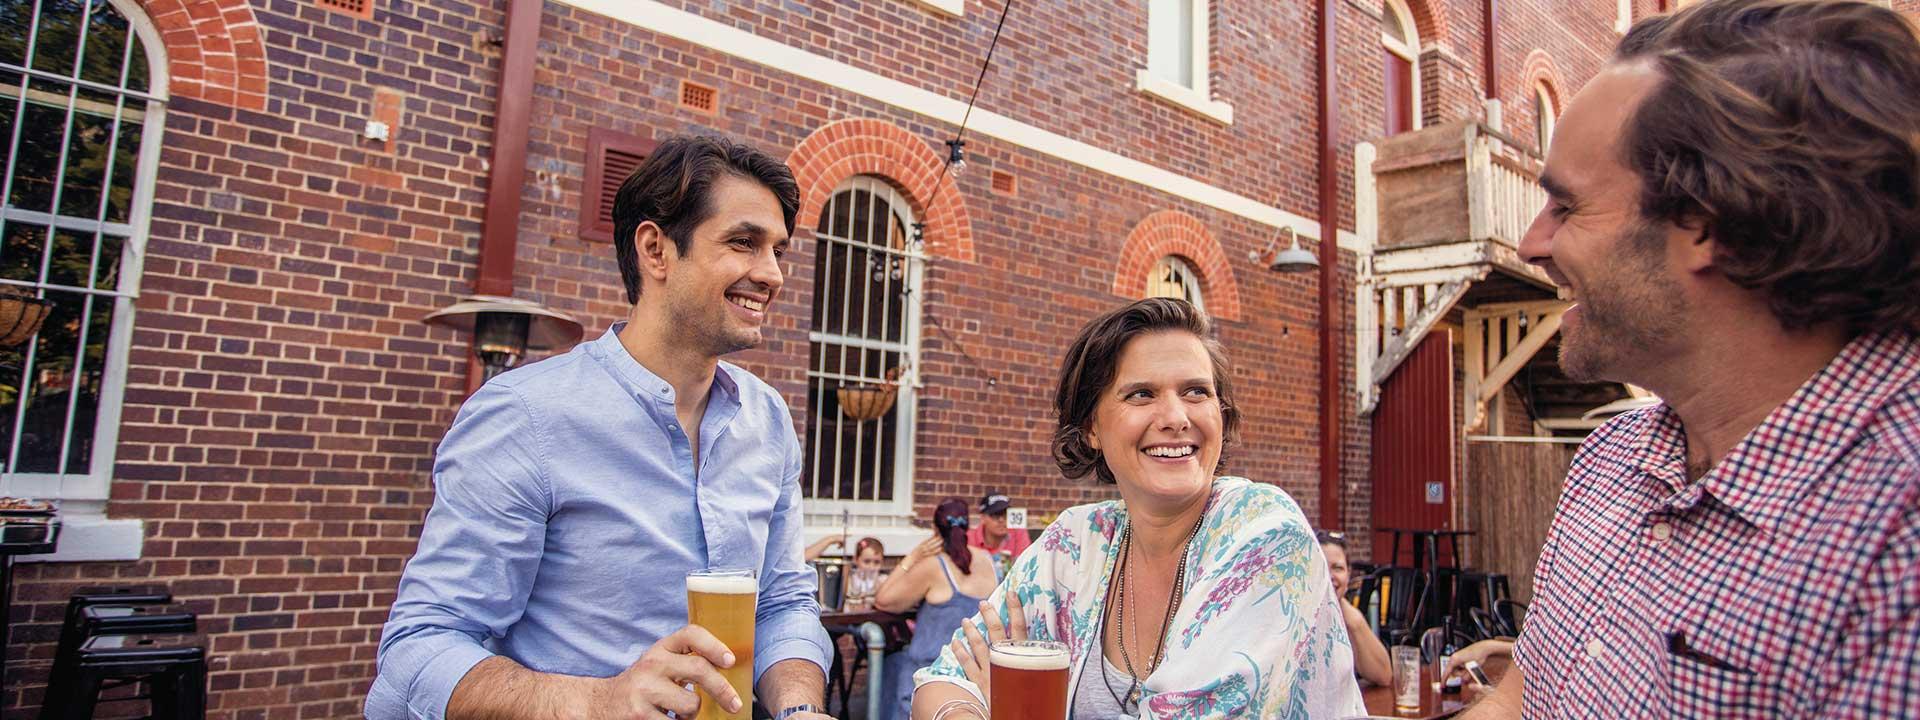 Enjoy a drink in Ipswich